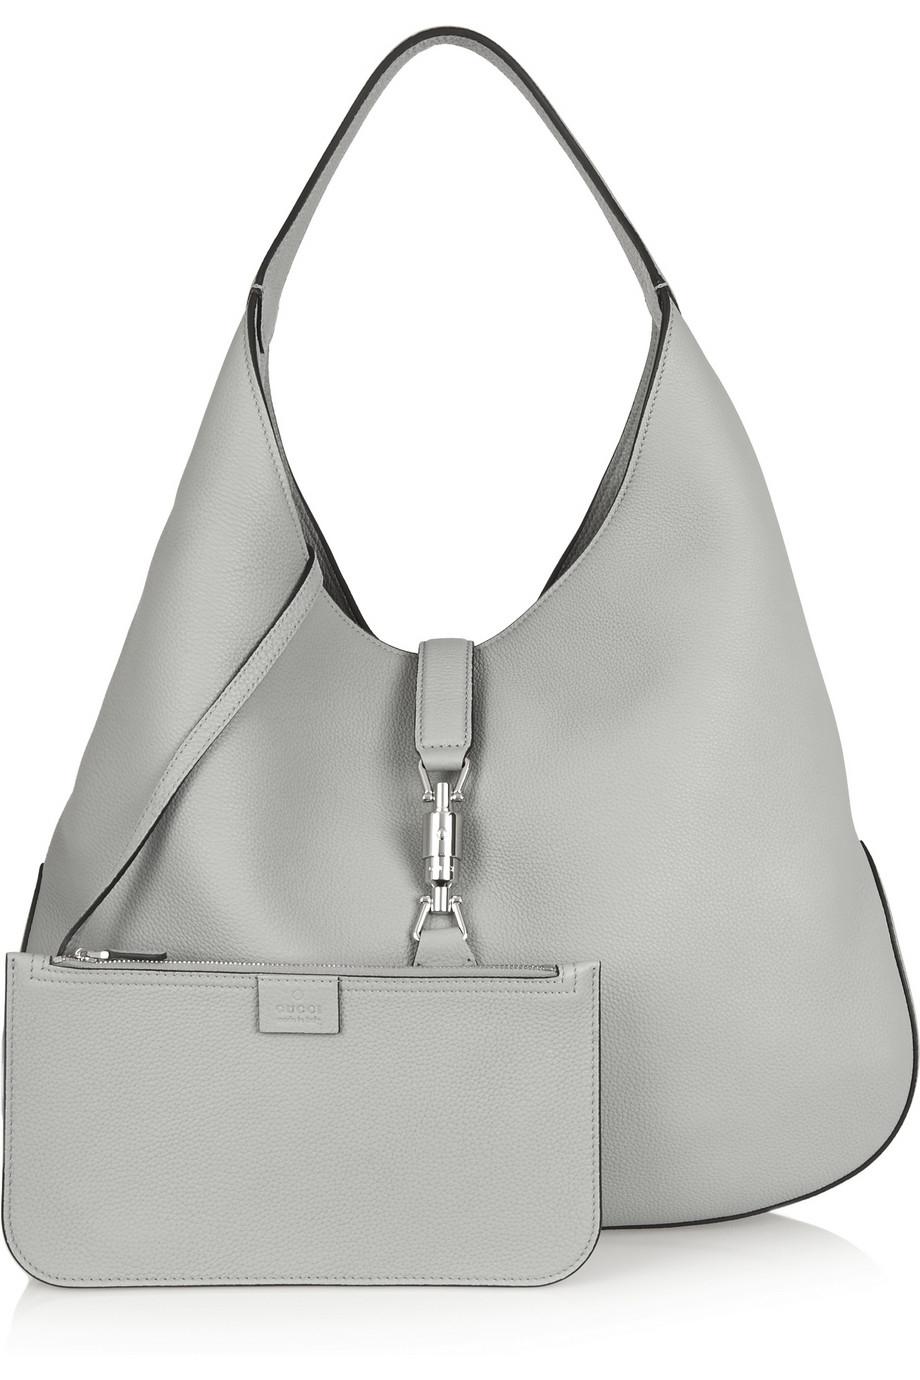 c36c2674b Gucci Leather Jackie Hobo Bag